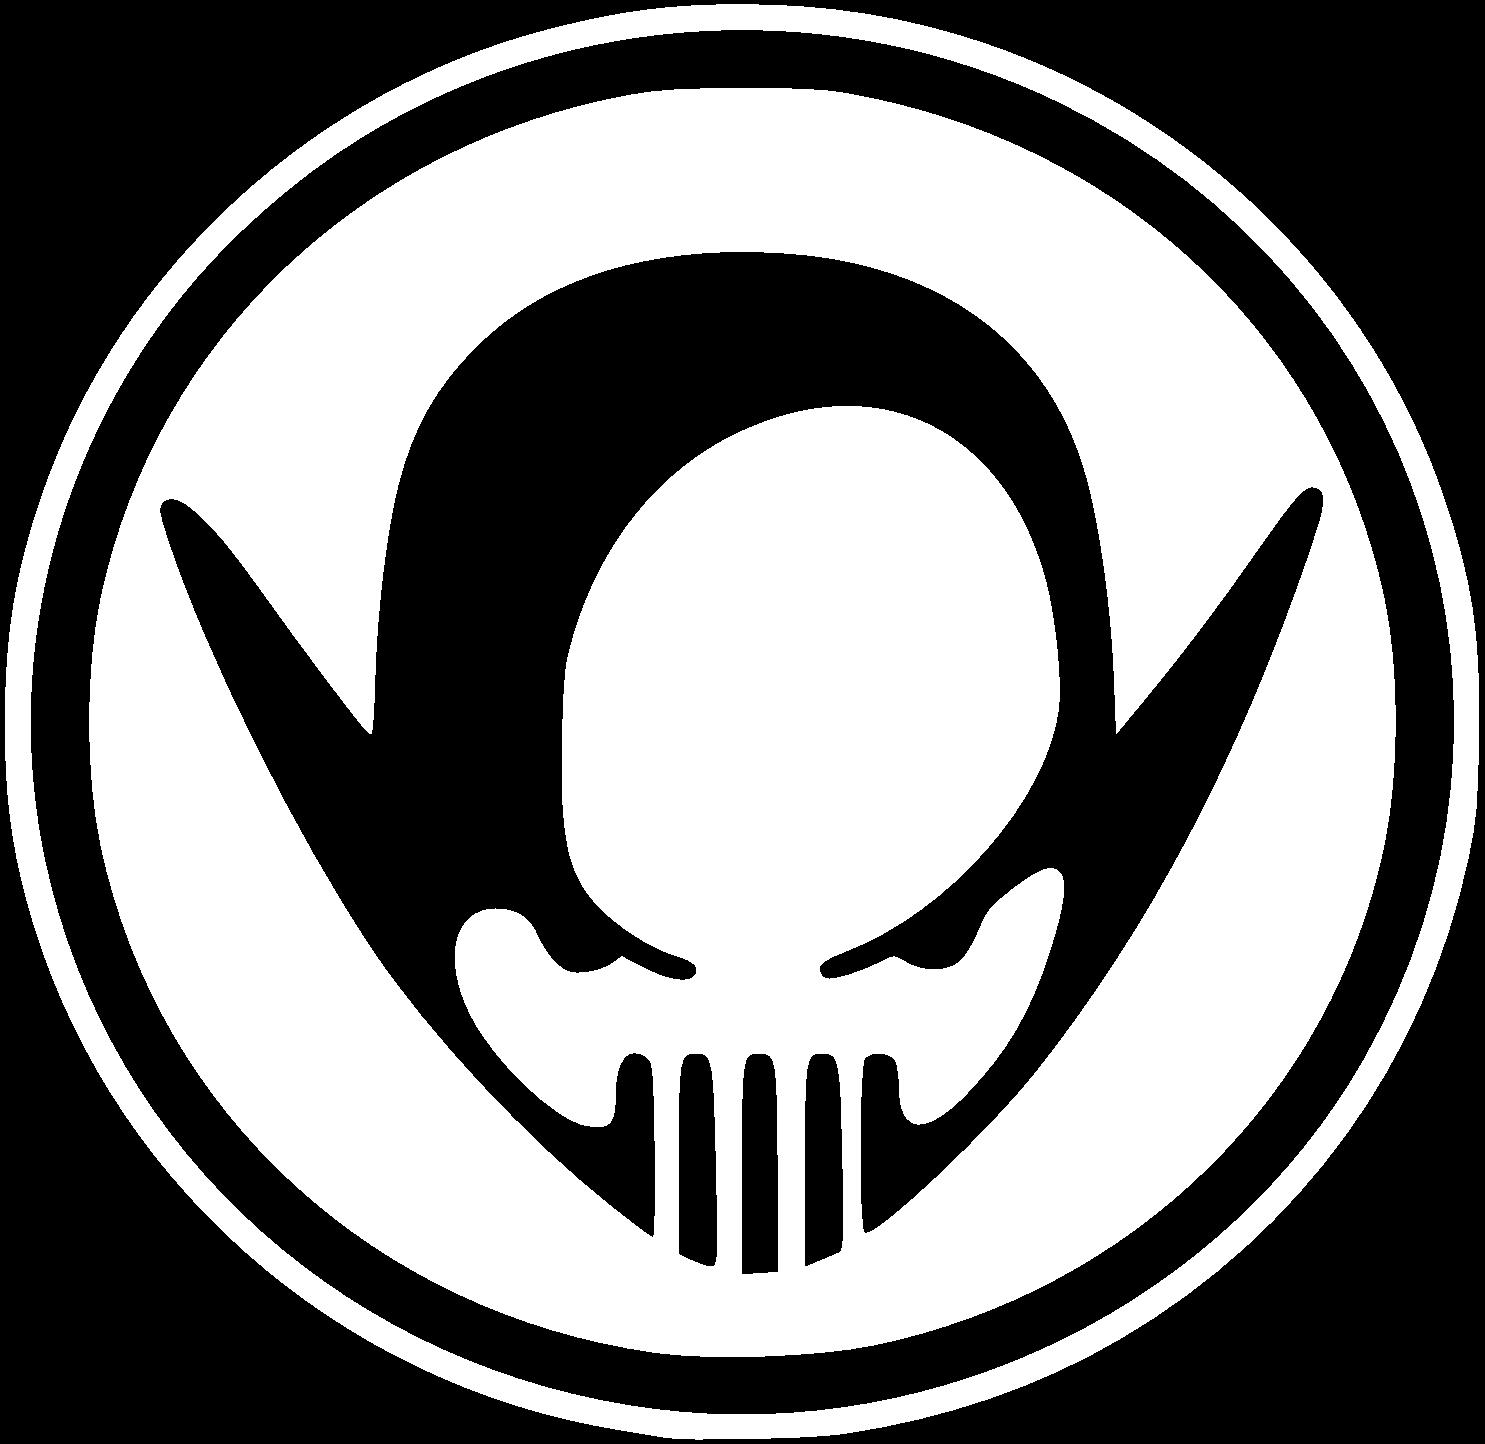 Pin De Sebas En Logos De Rock Nacional Piojos Rock Logos Rock Dibujos